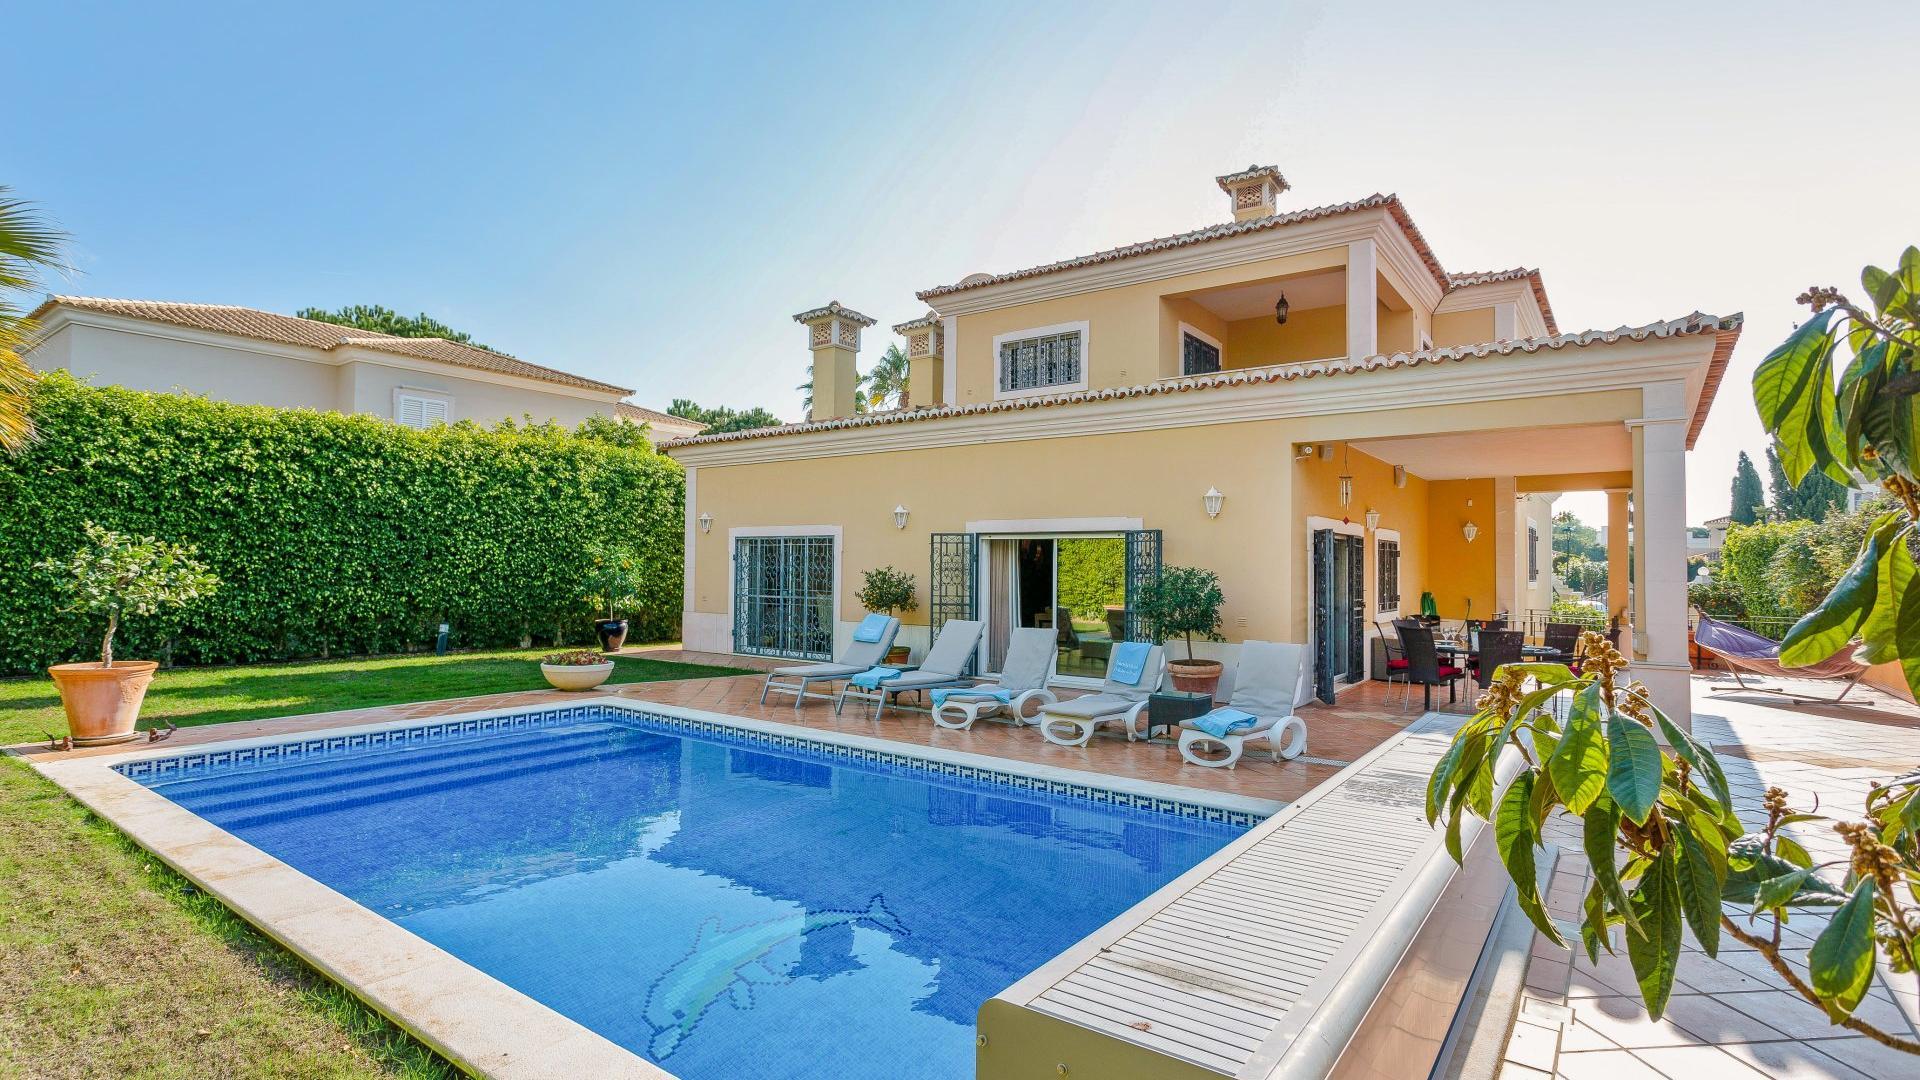 Villa Cyan - Varandas do Lago, Quinta do Lago, Algarve - _P1_8307_-_Copy.jpg